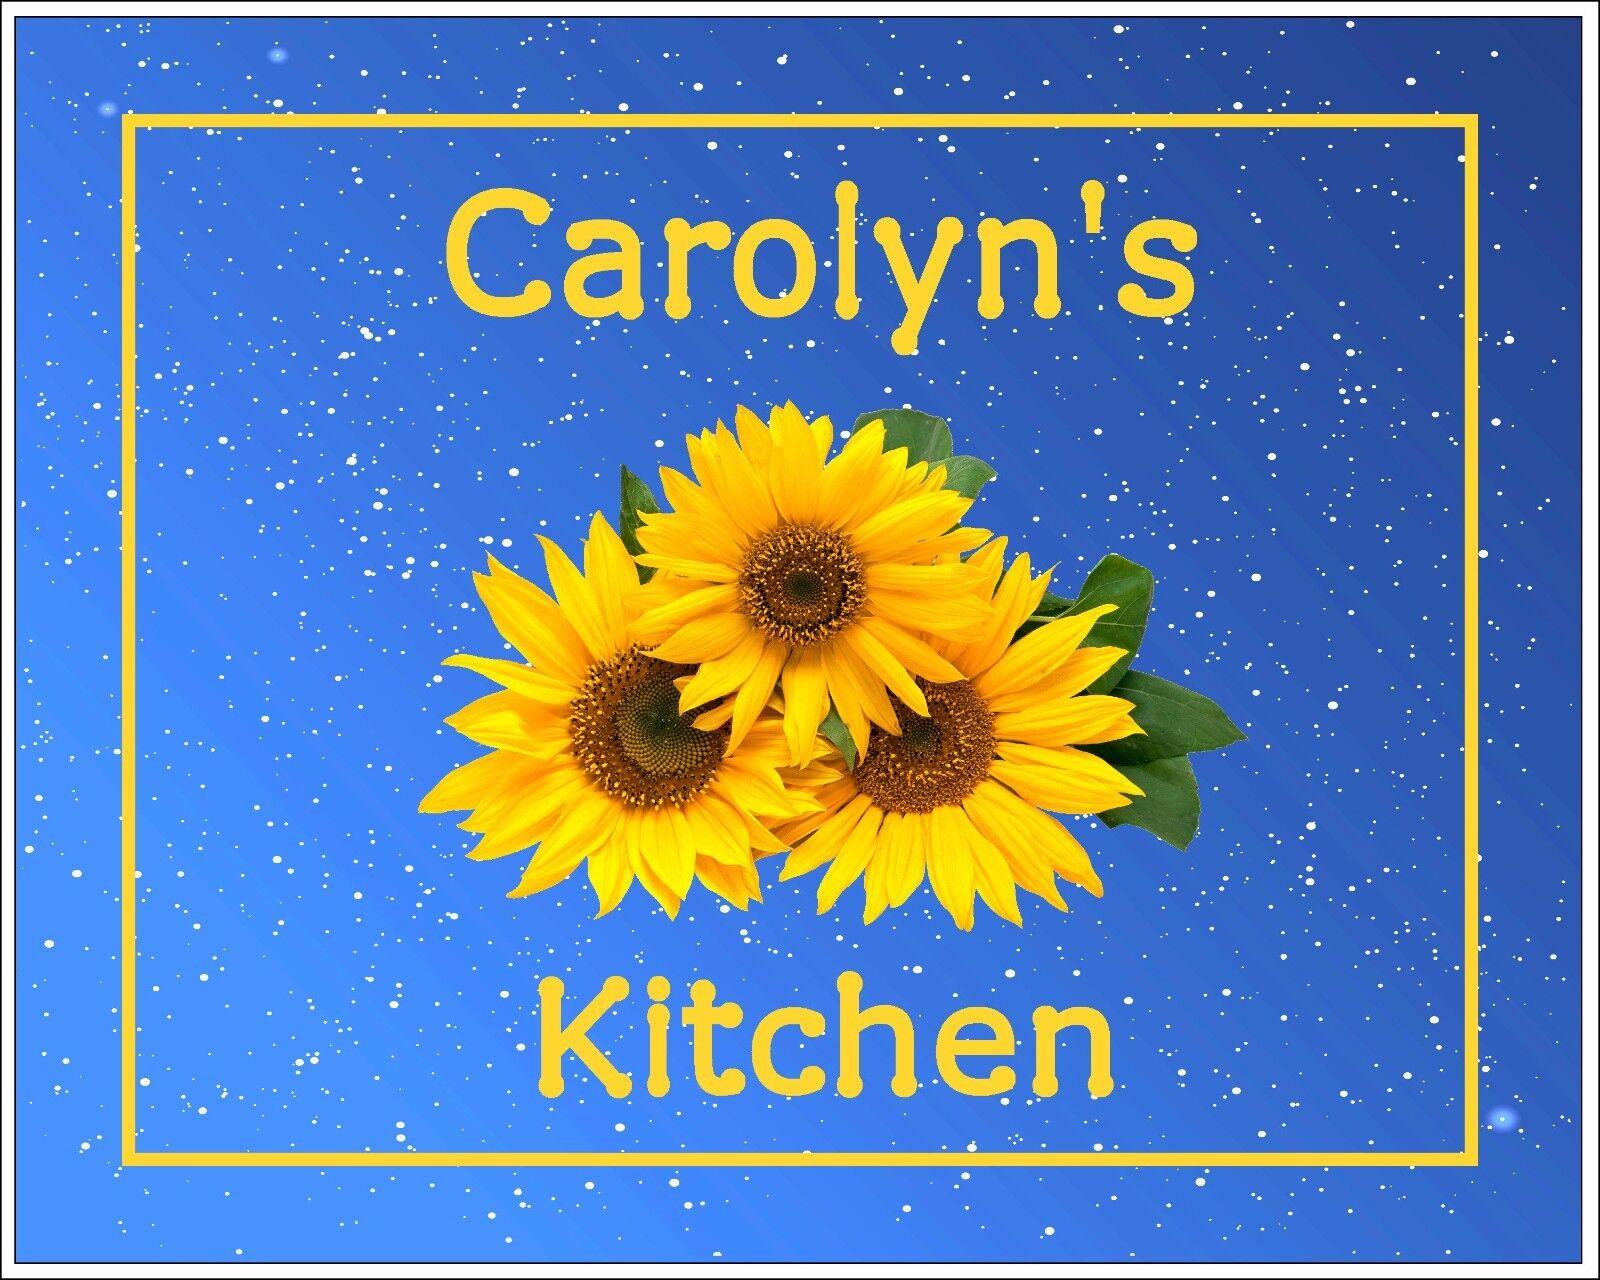 Blue Yellow Photo Art Wall Decor Kitchen Sunflowers Personalized Picture Gift Ebay